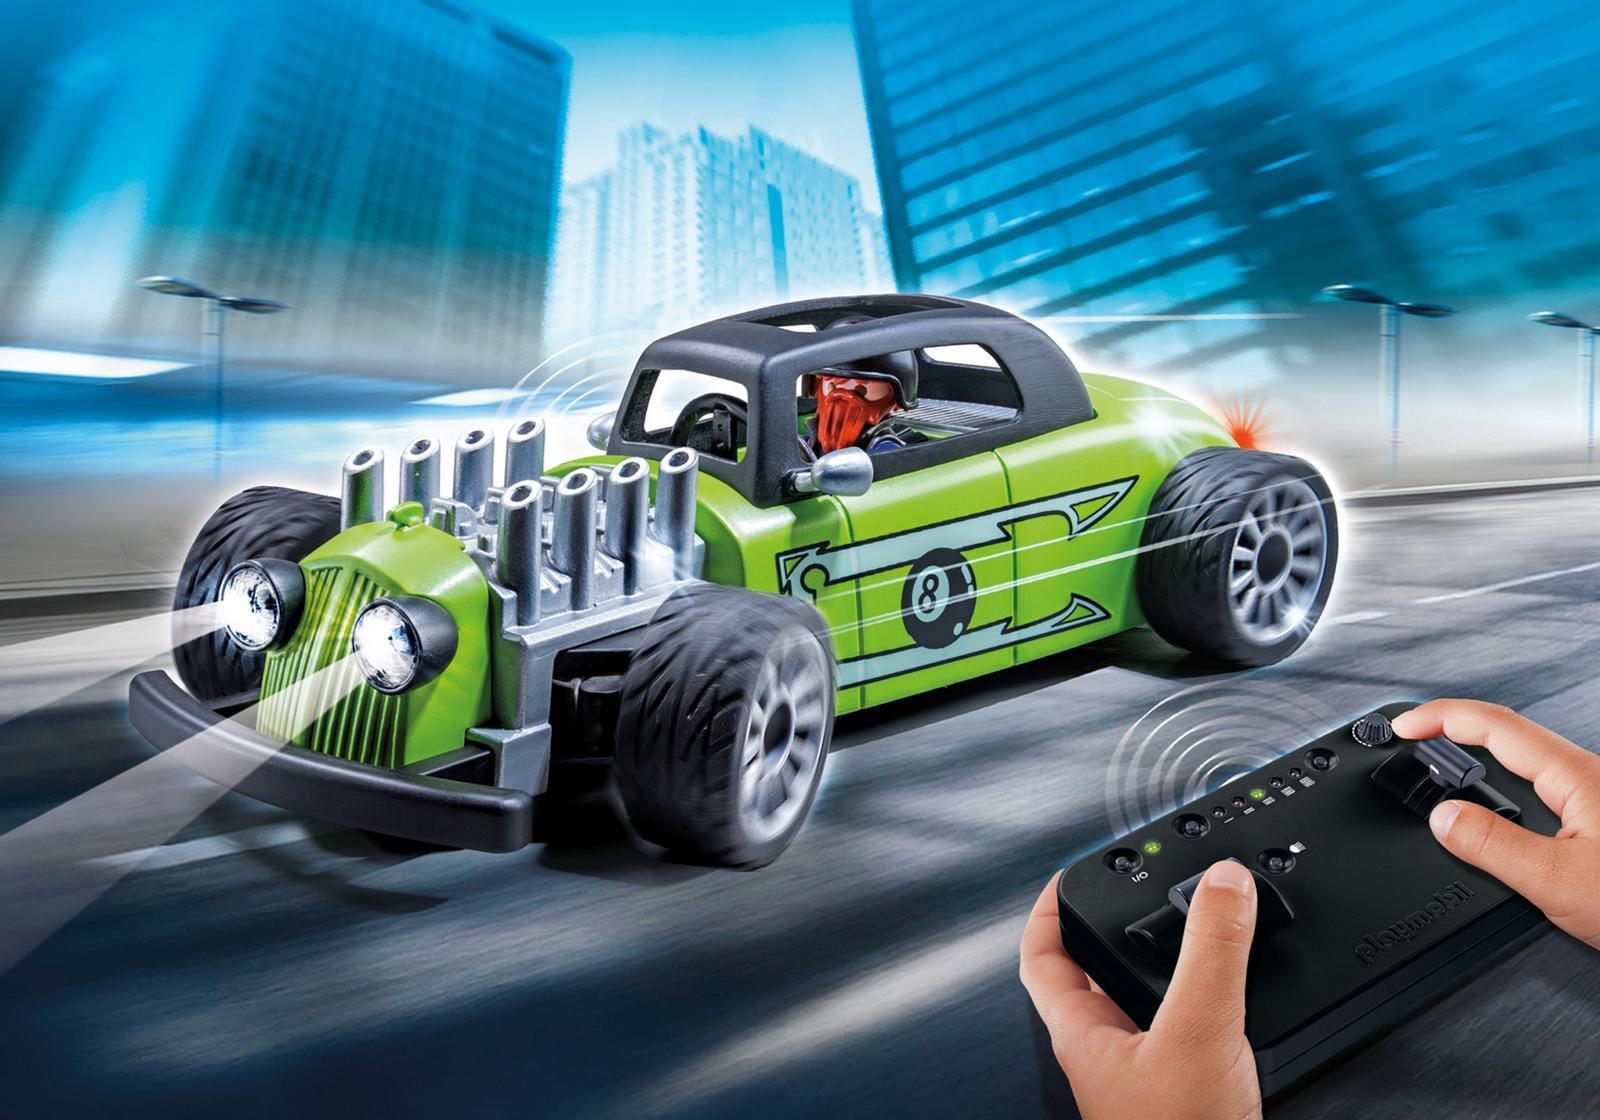 Masina-de-curse-cu-telecomanda-verde-PM9091-Playmobil-SportsAction-1